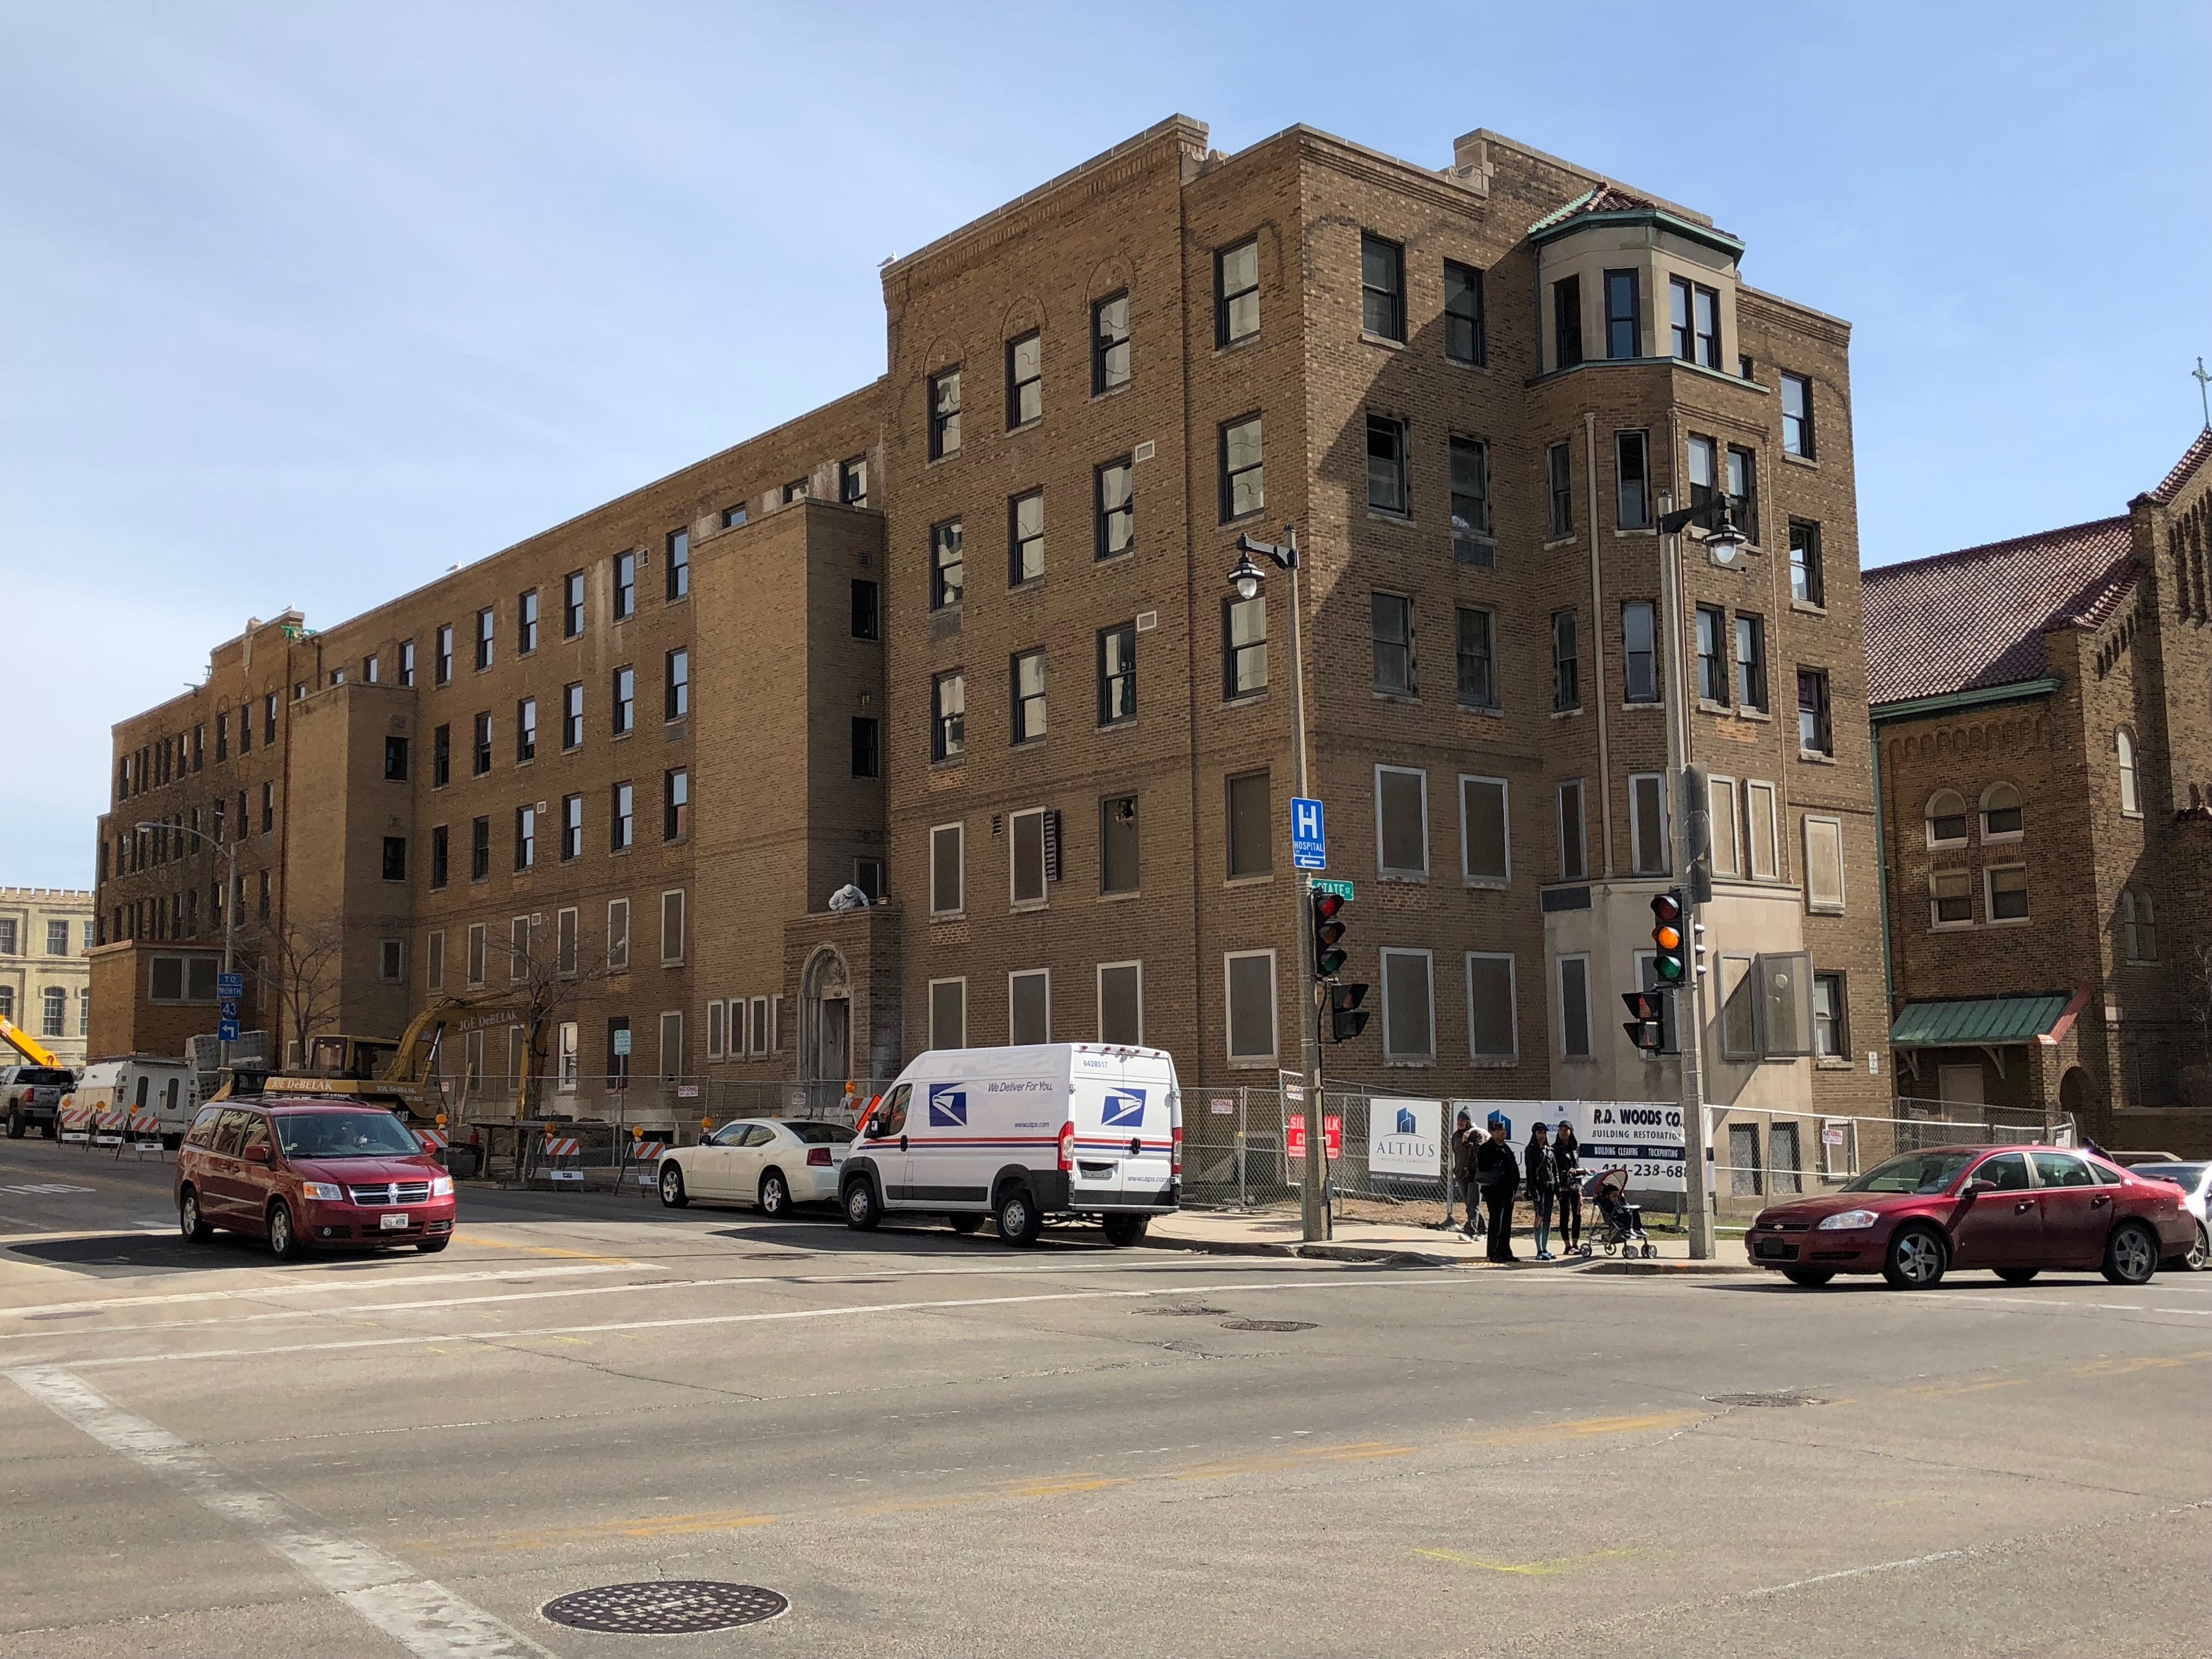 St. Anthony Apartments. Photo taken April 2018 by Jeramey Jannene.